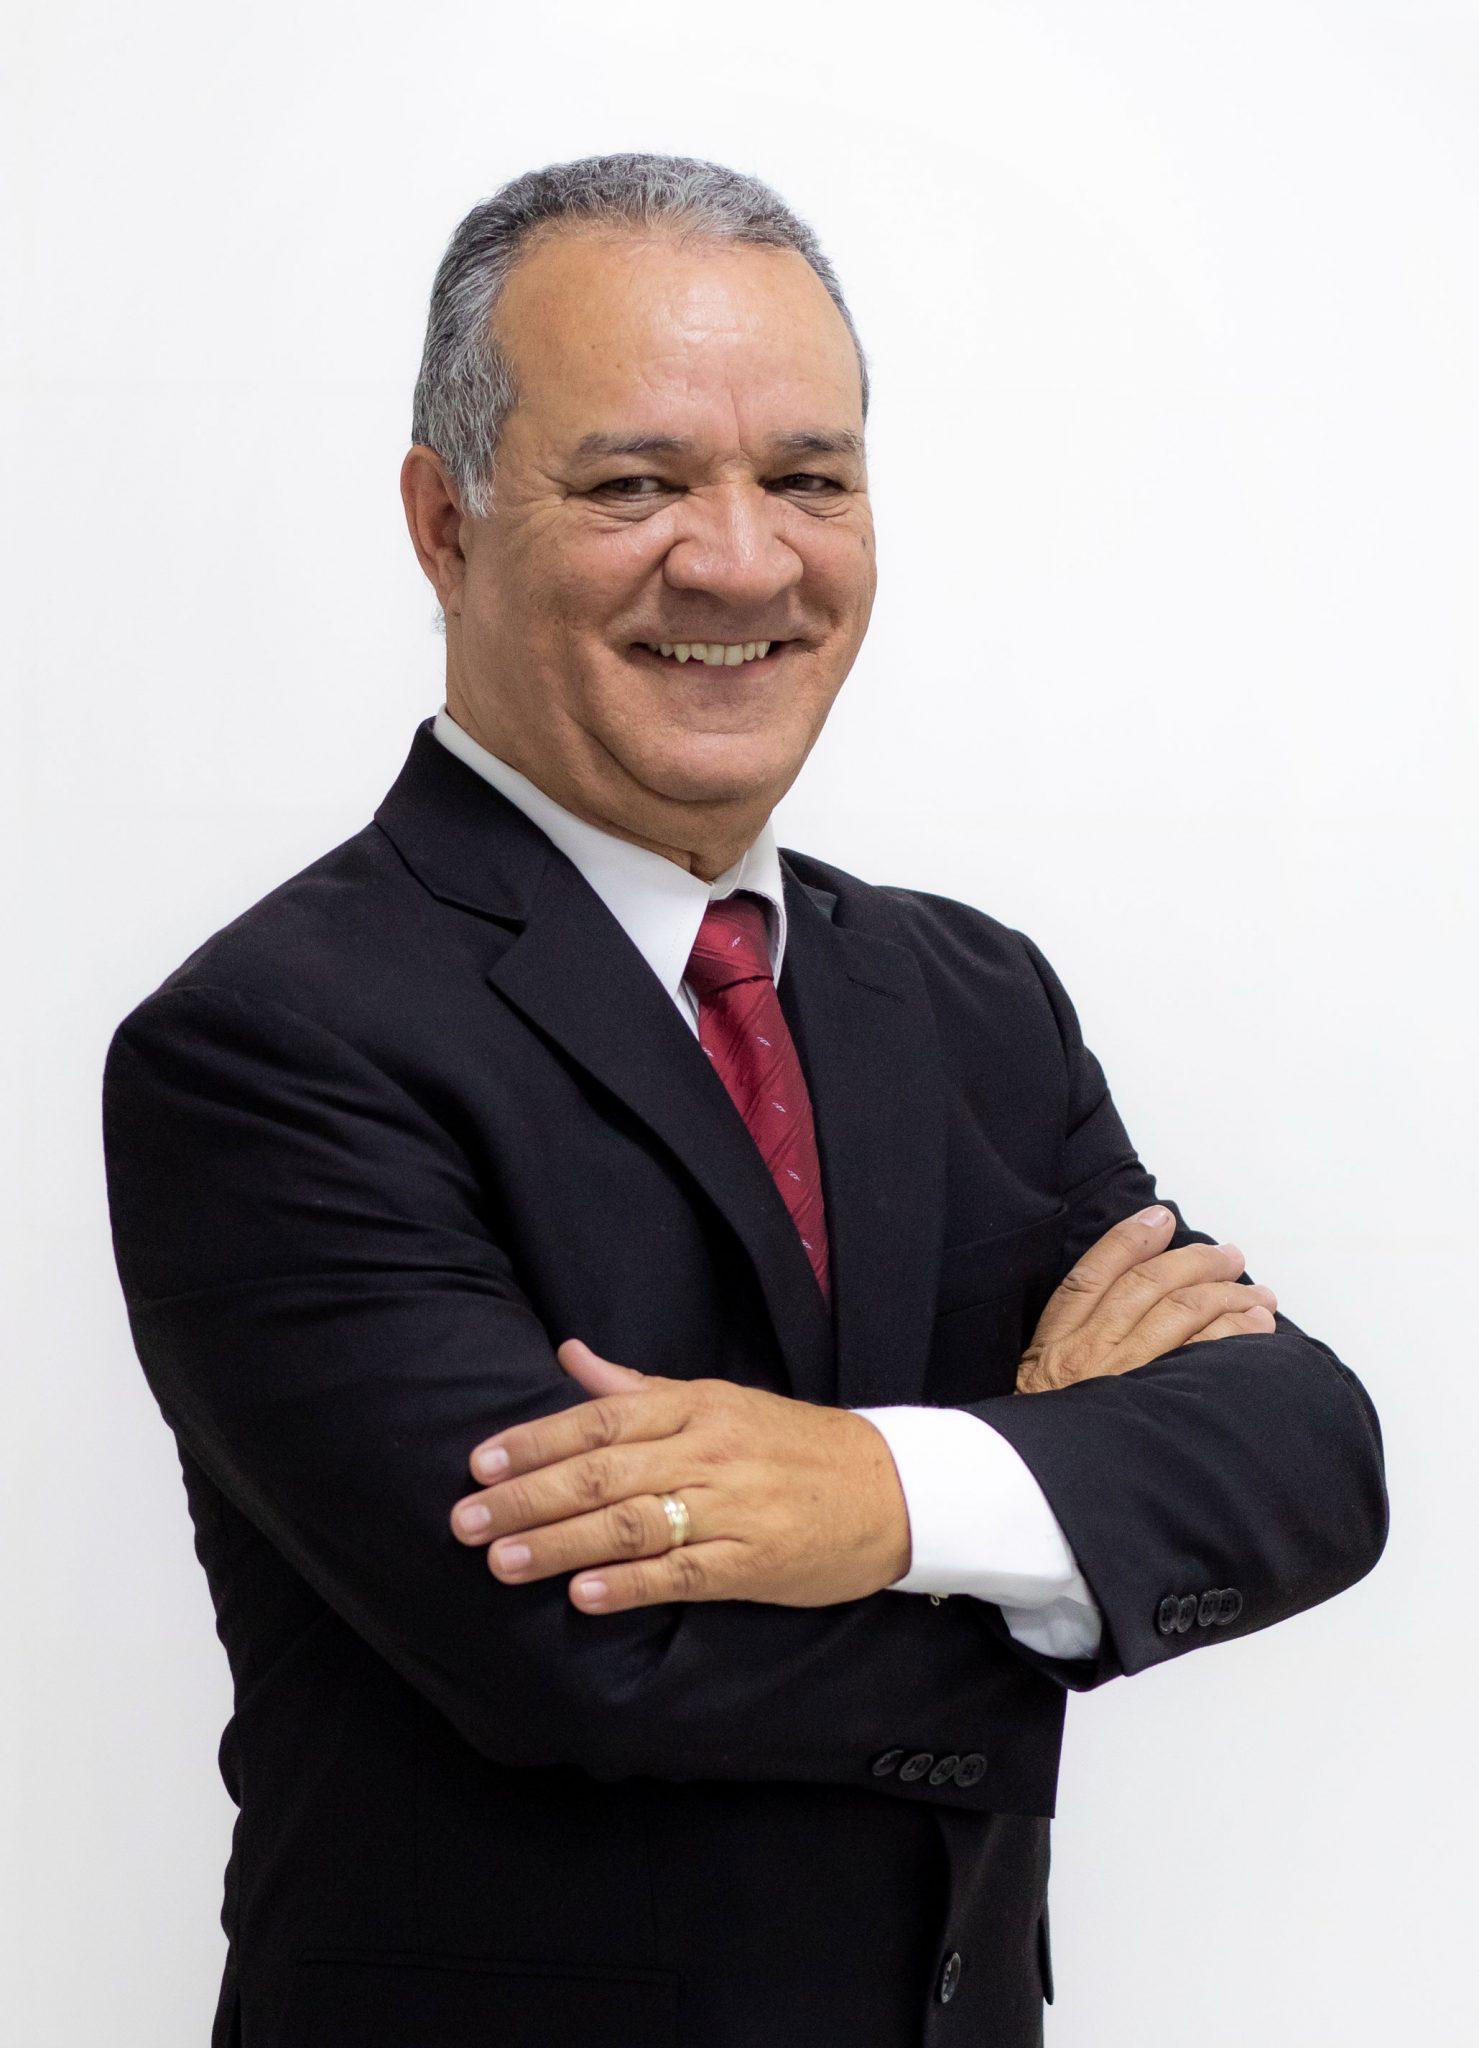 Walter Reis Calheiros